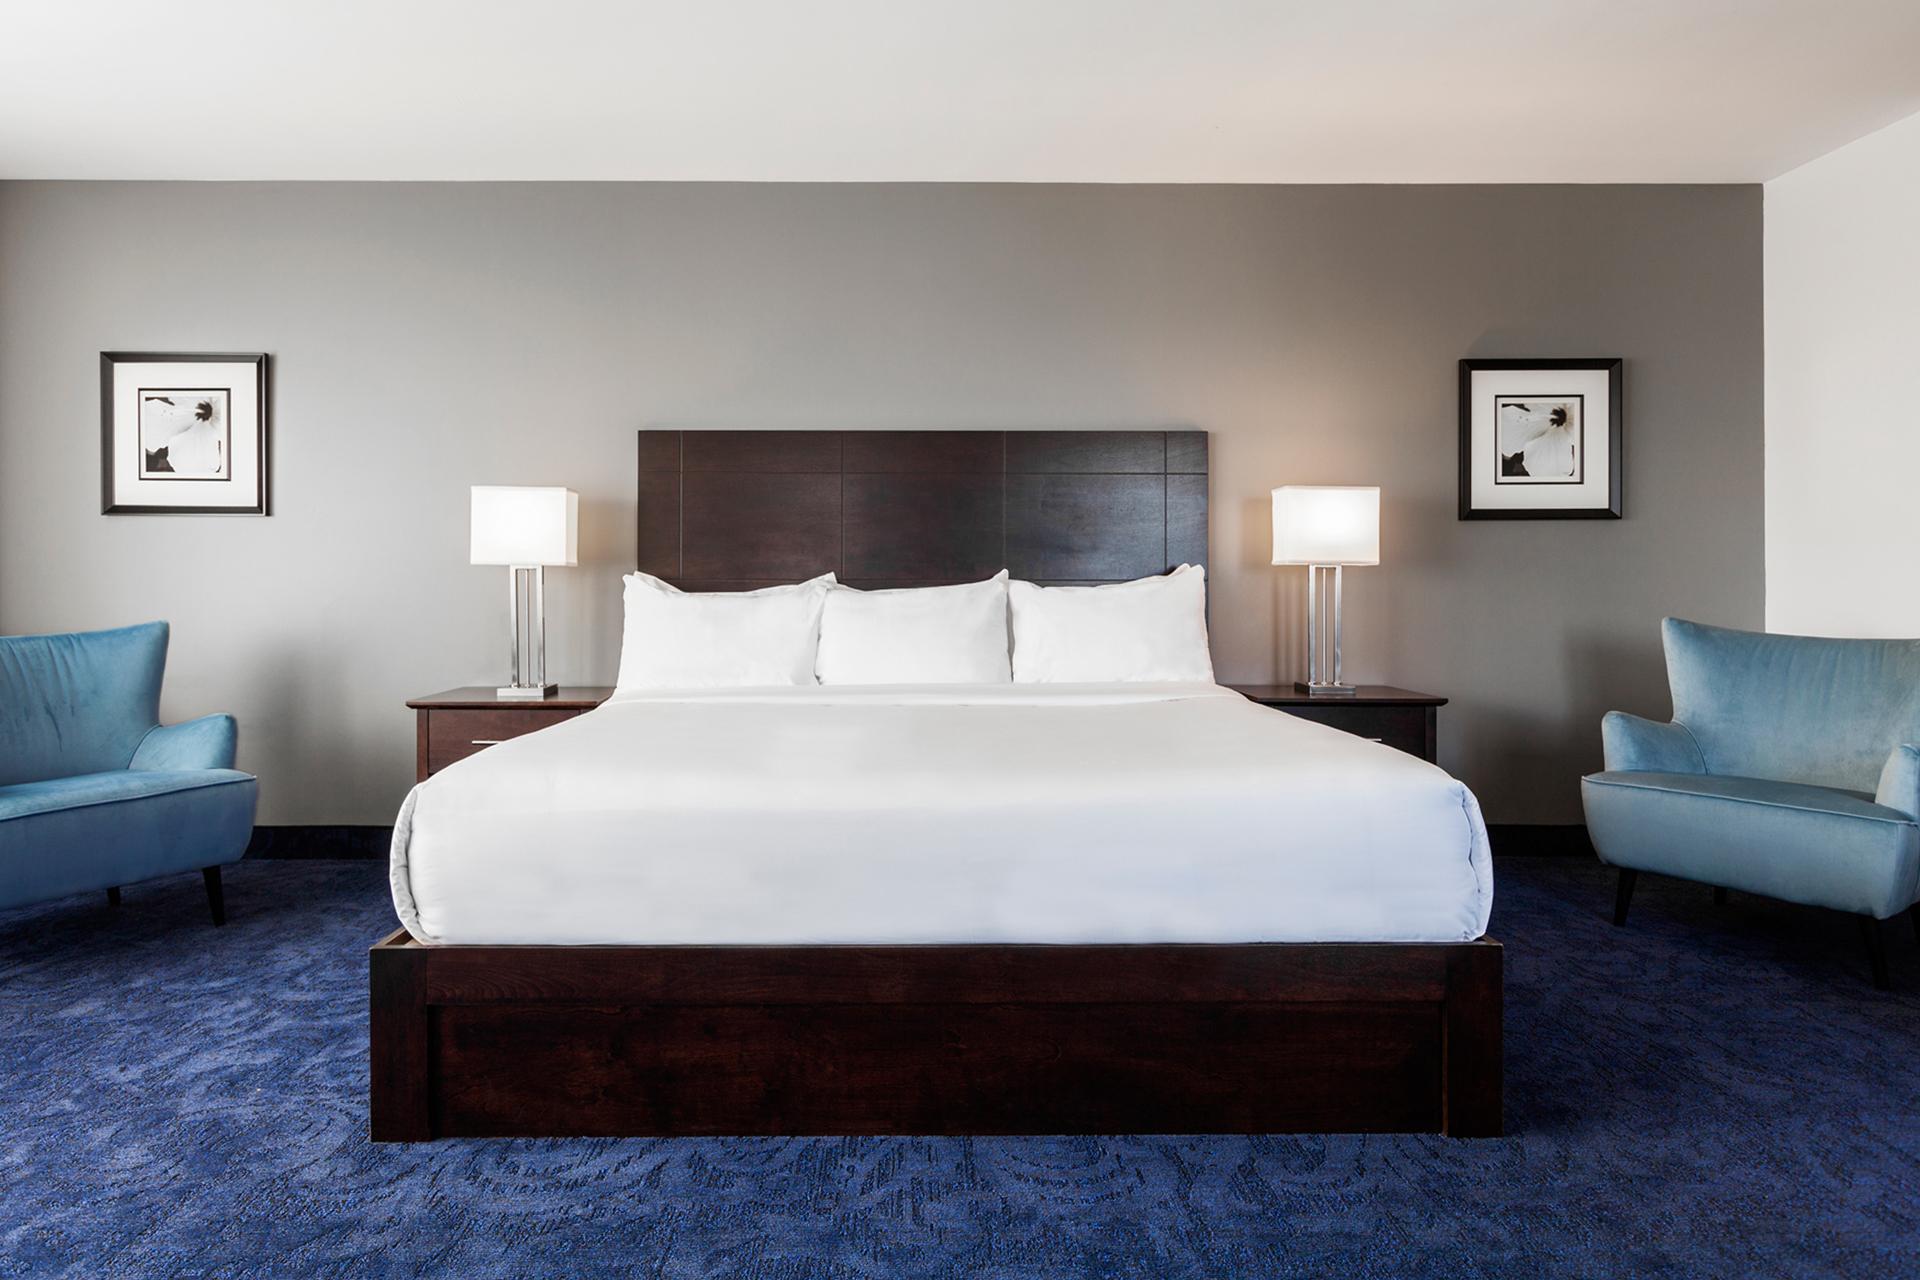 Imperia Hotels & Suites St-Eustache